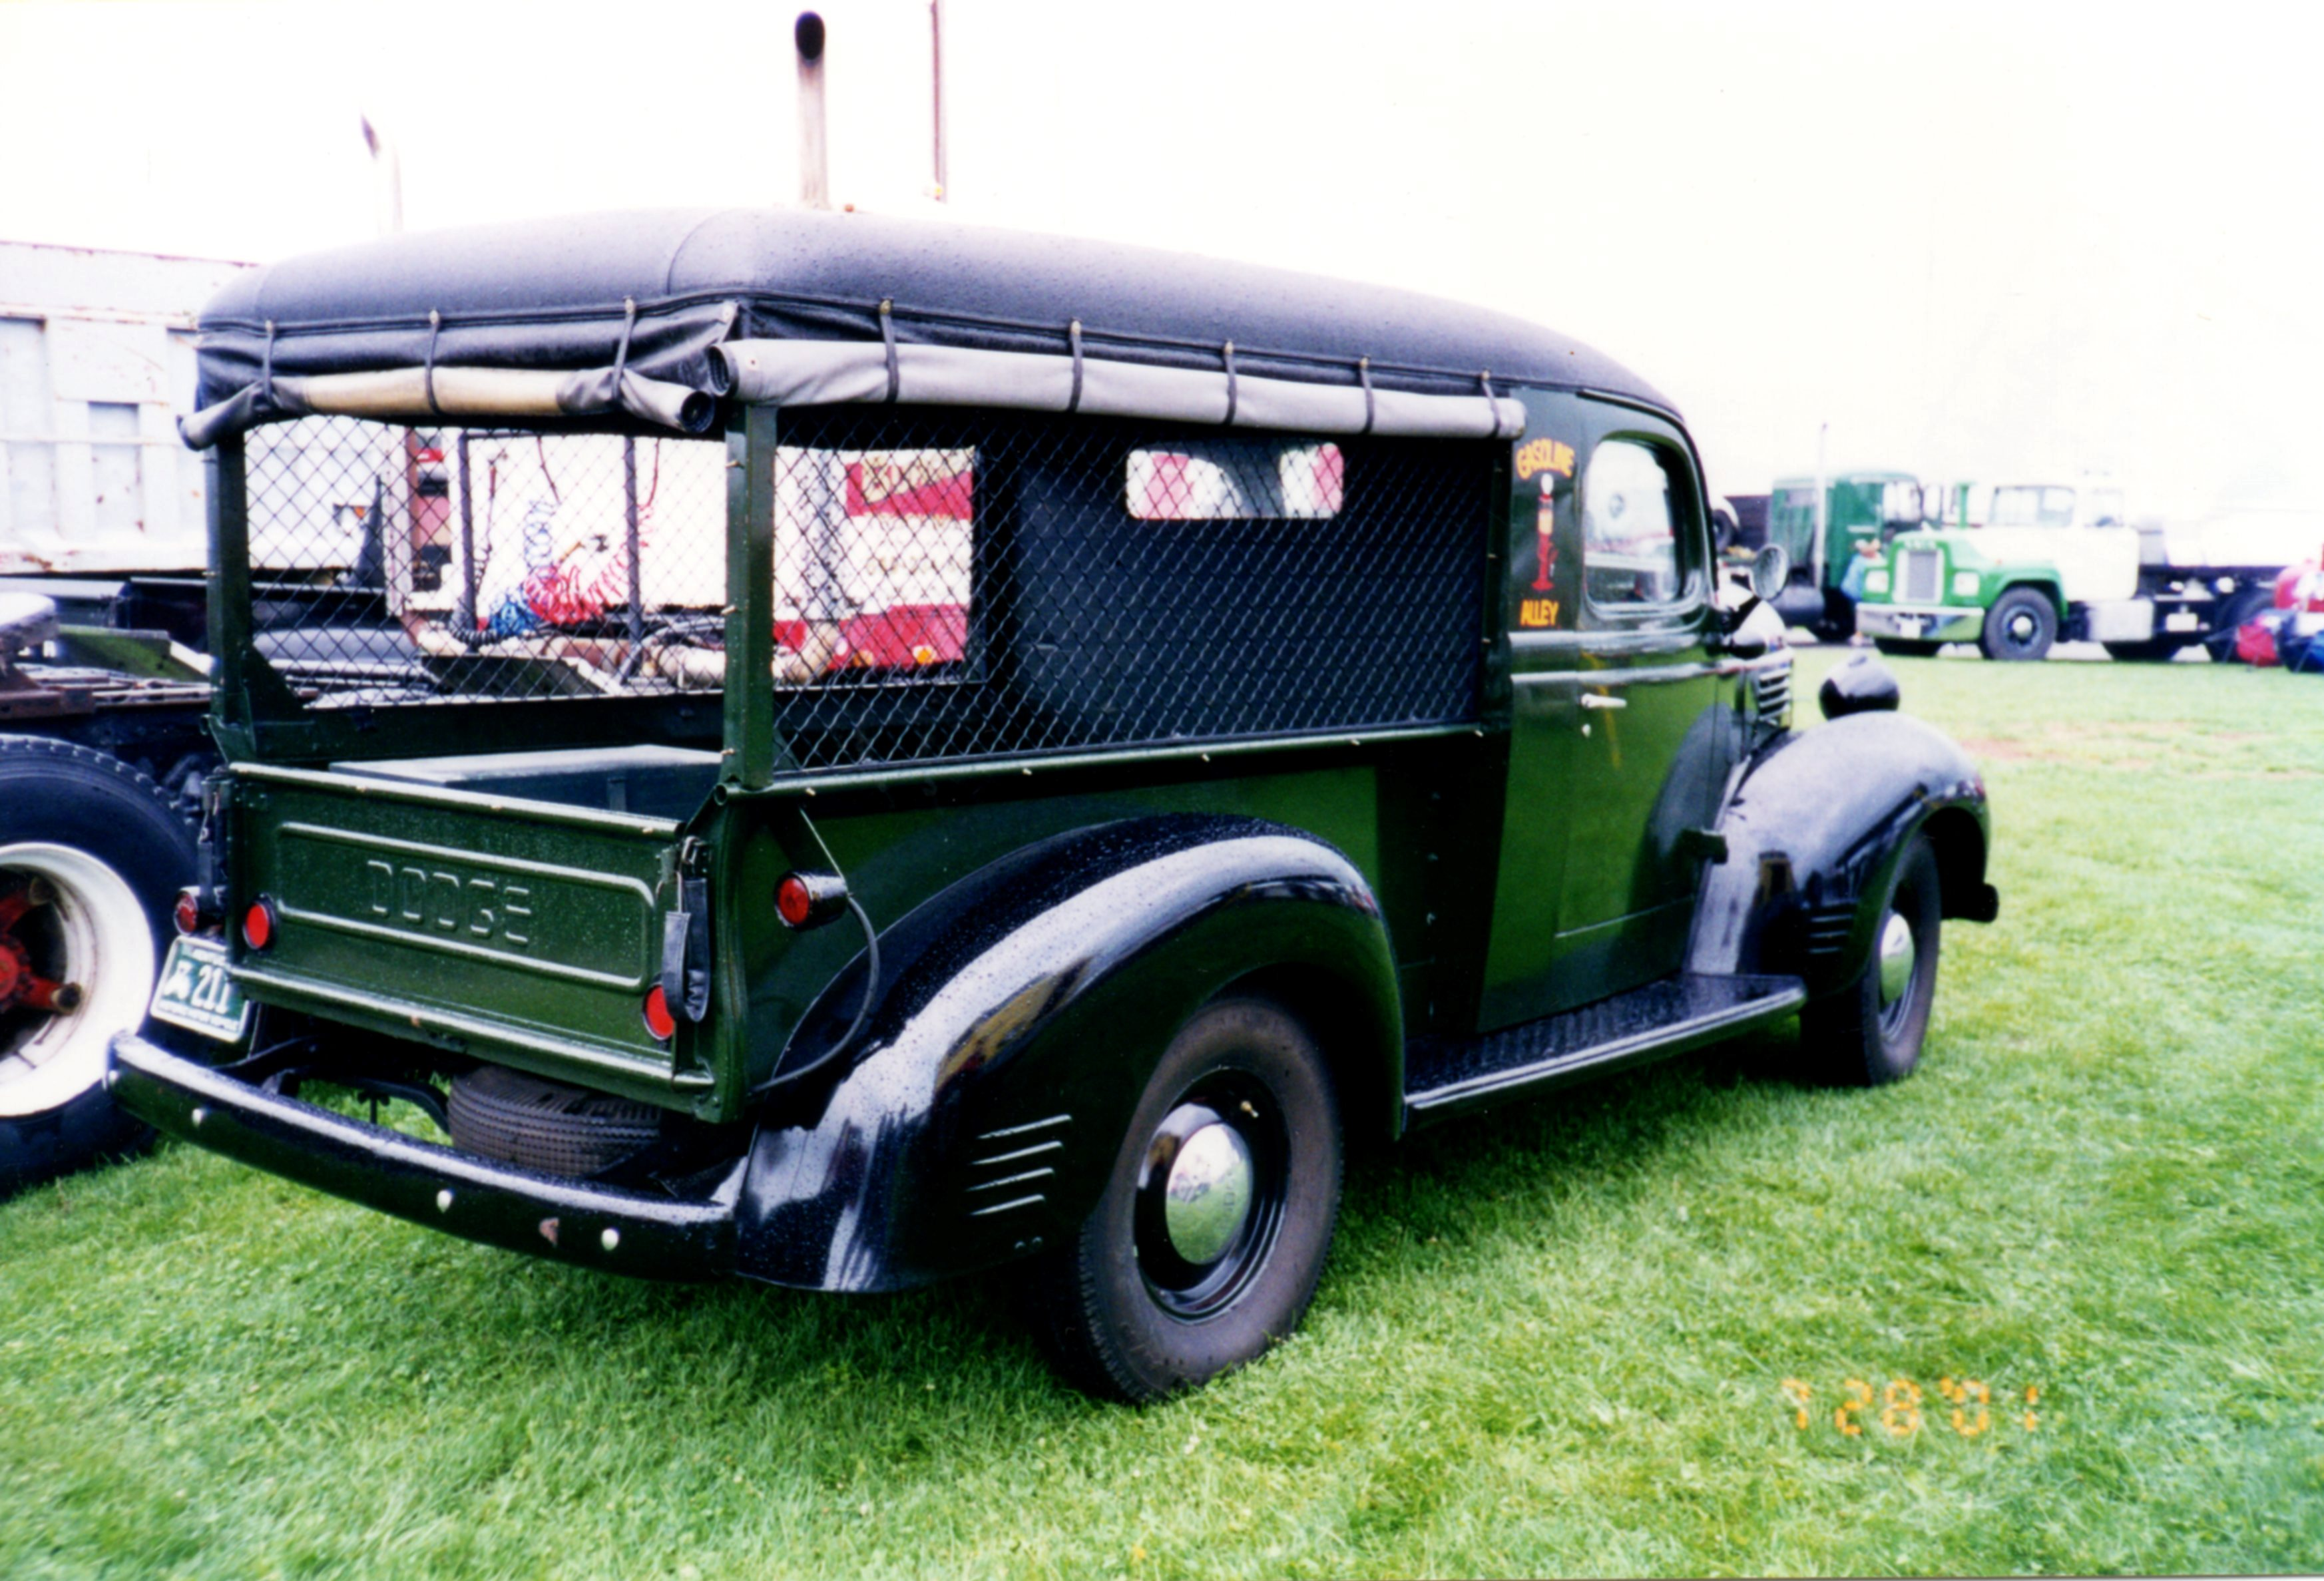 File1940 Dodge Canopy Express - 02.jpg  sc 1 st  Wikimedia Commons & File:1940 Dodge Canopy Express - 02.jpg - Wikimedia Commons